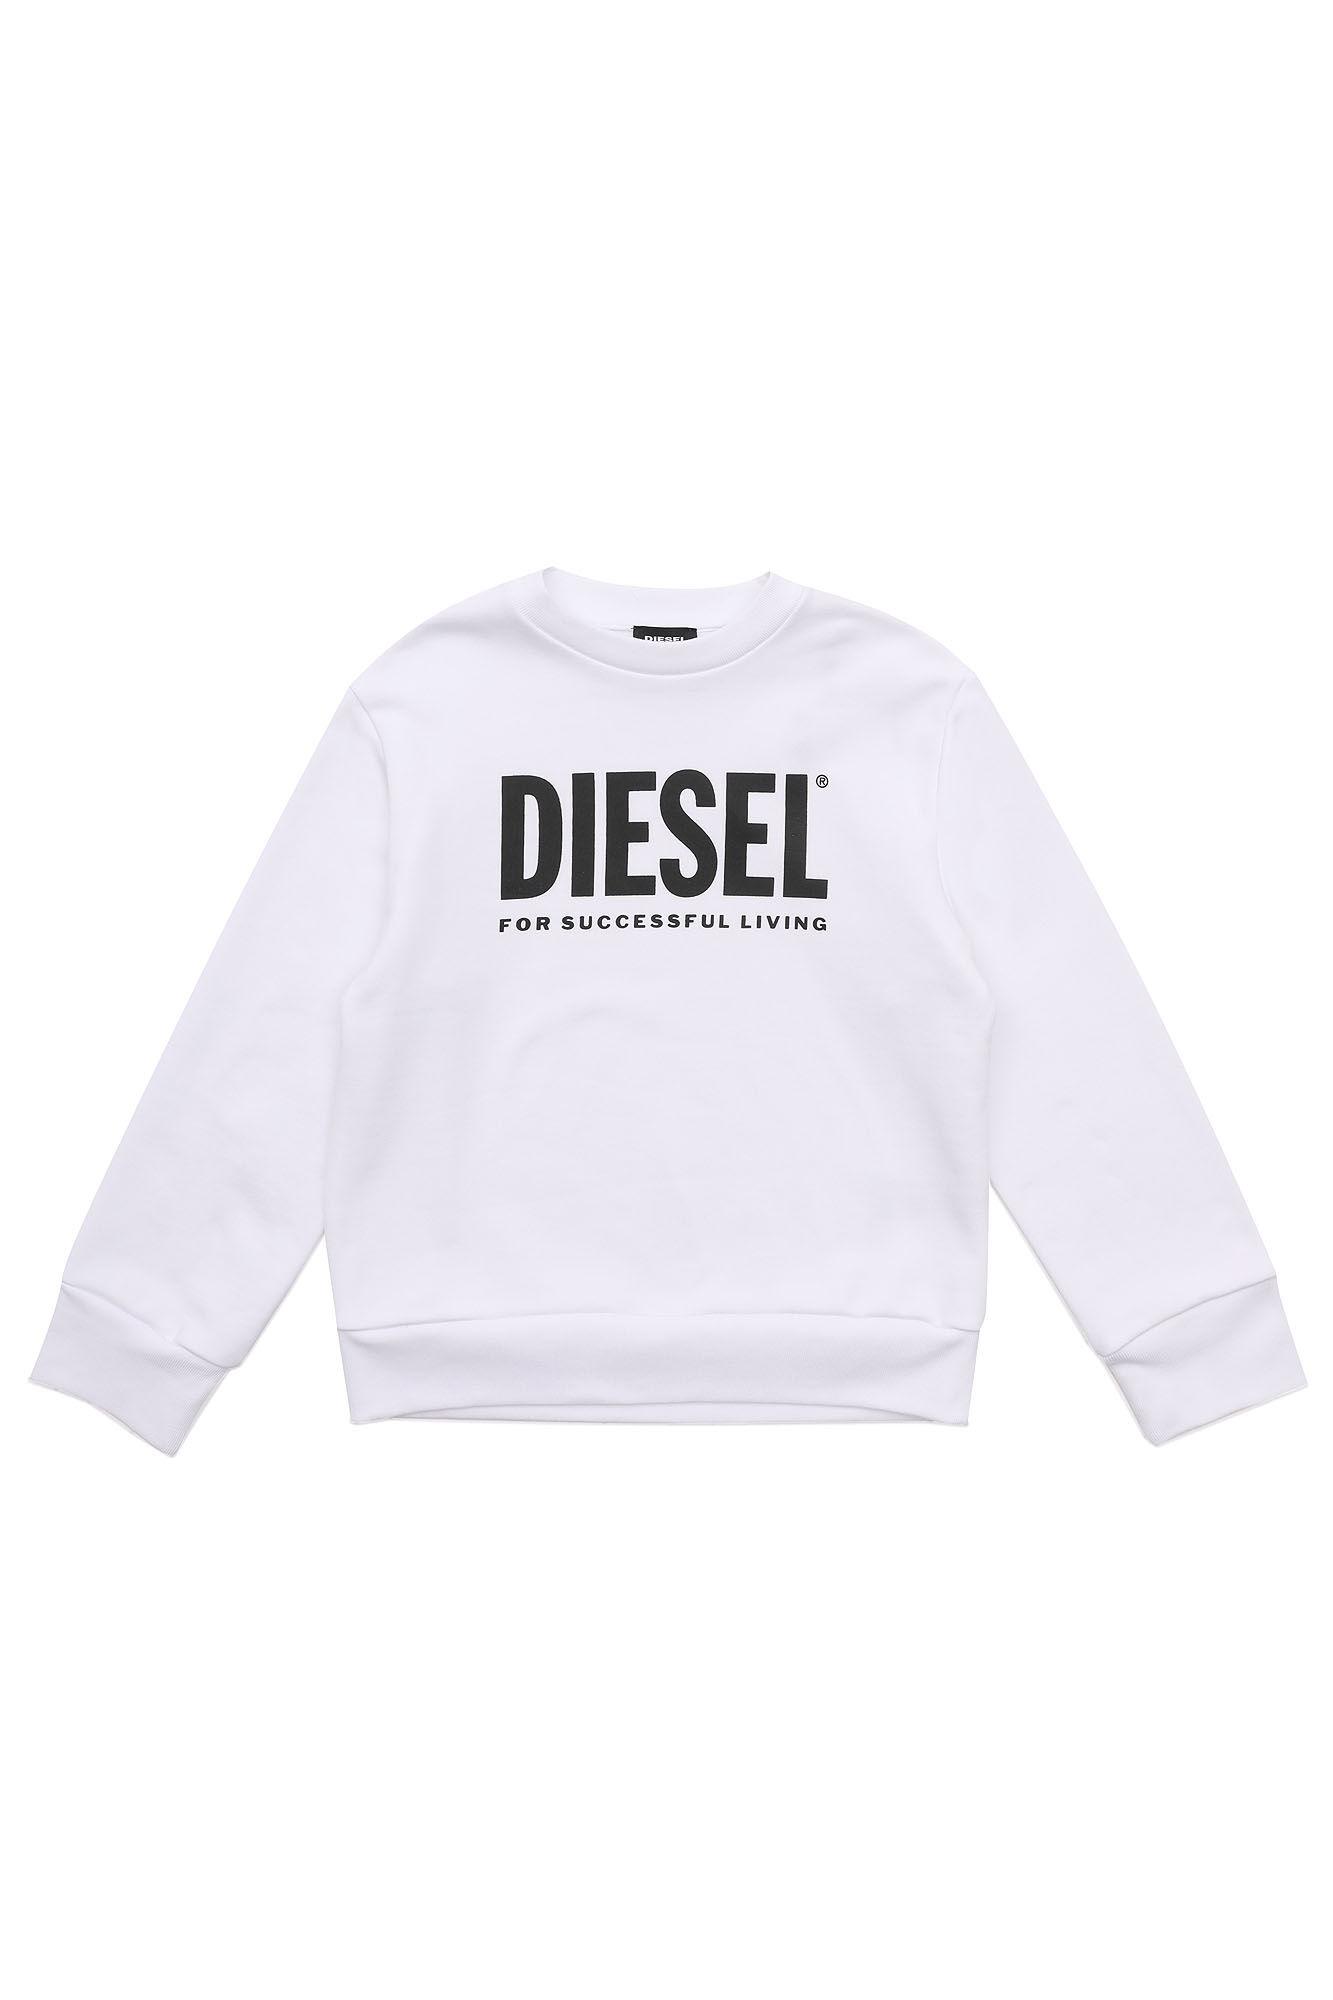 Screwdivision-Logo Over Sweatshirt - Diesel Kid